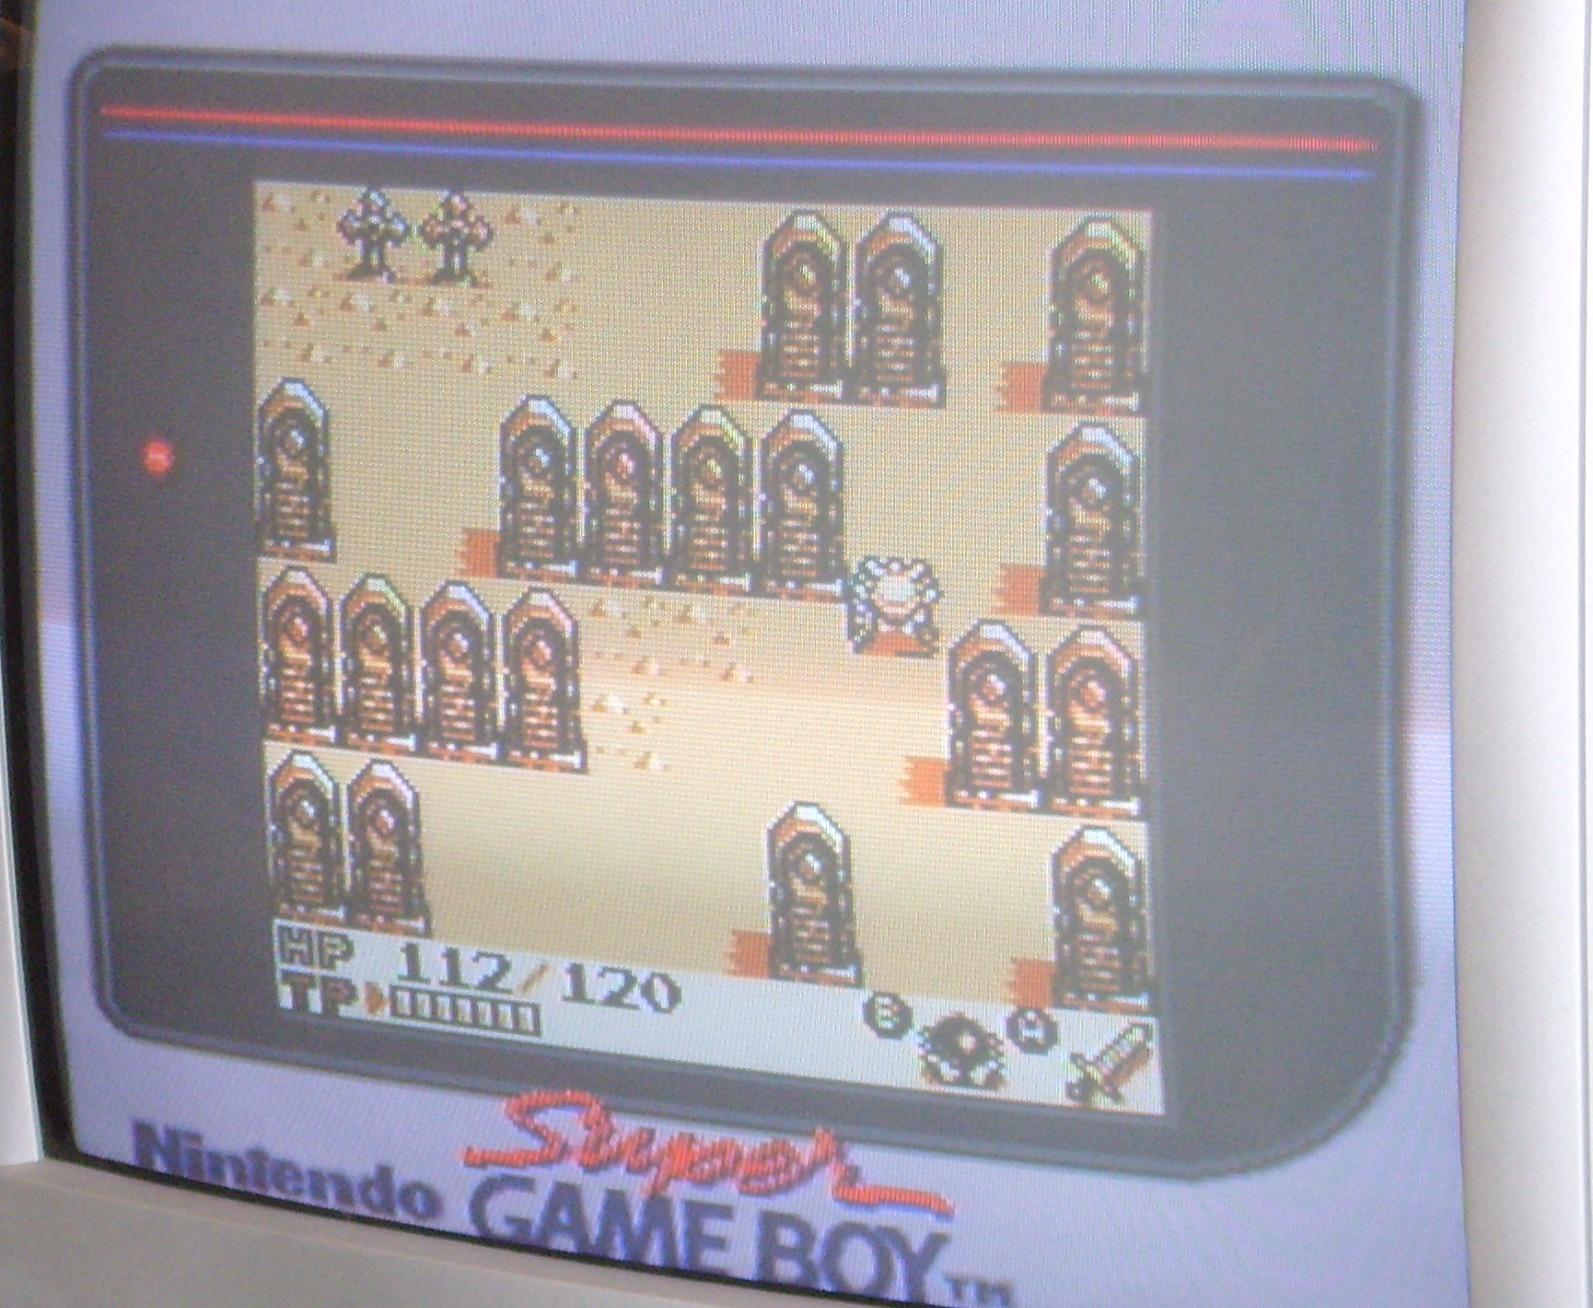 Japanspel Blog: Velious II (Rolan's Curse 2) for Game Boy